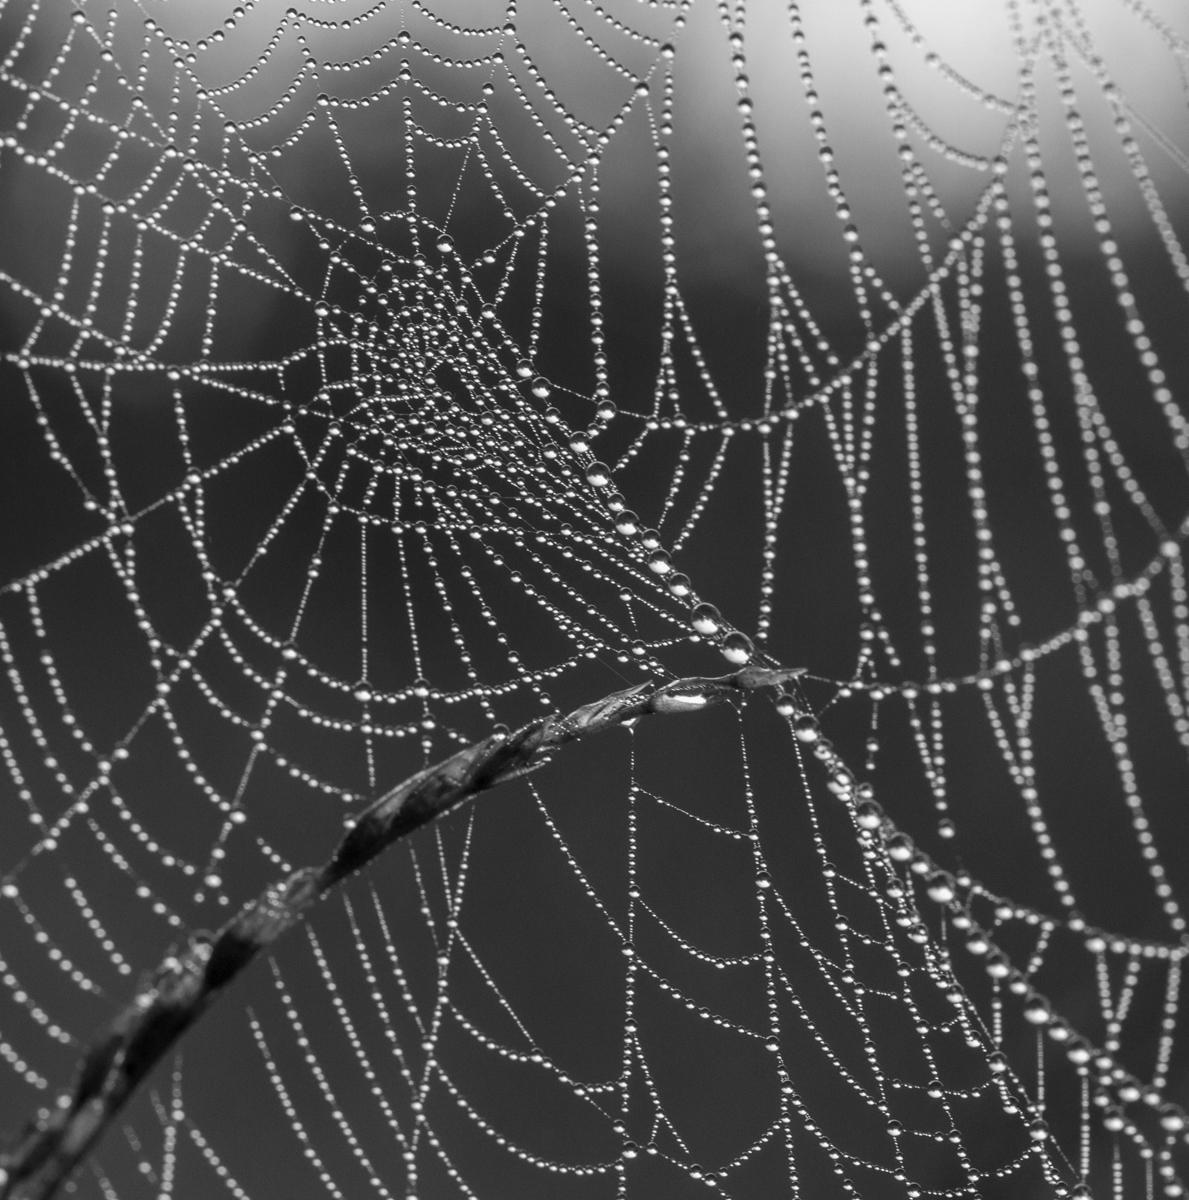 Spider Web Halloween Decorations: Roads End Naturalist